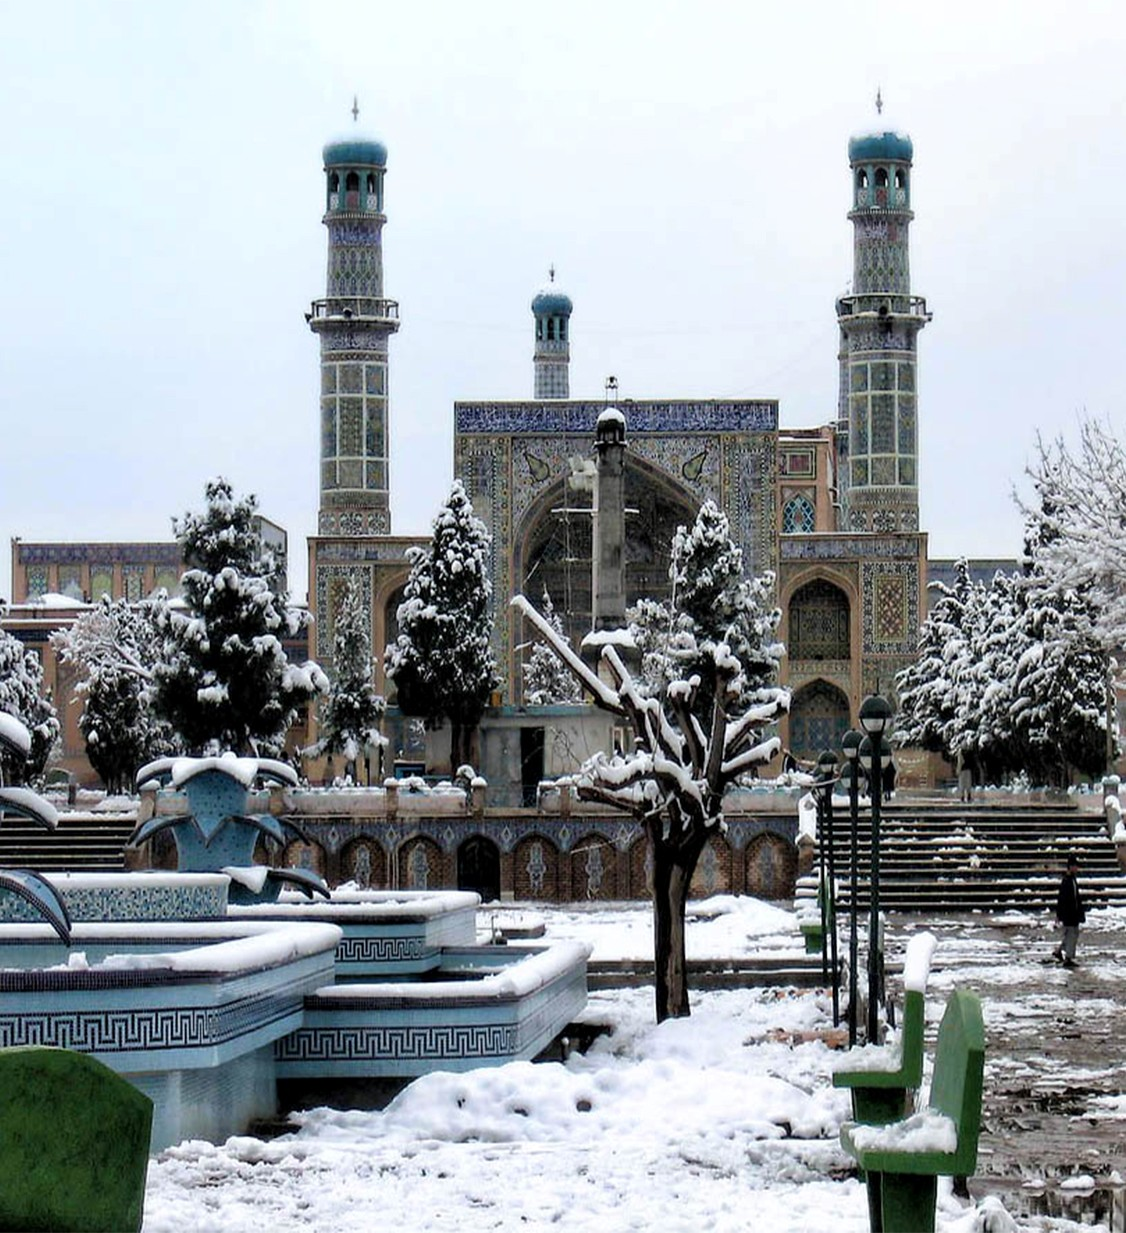 The Great Mosque in Herat, Afgahnistan